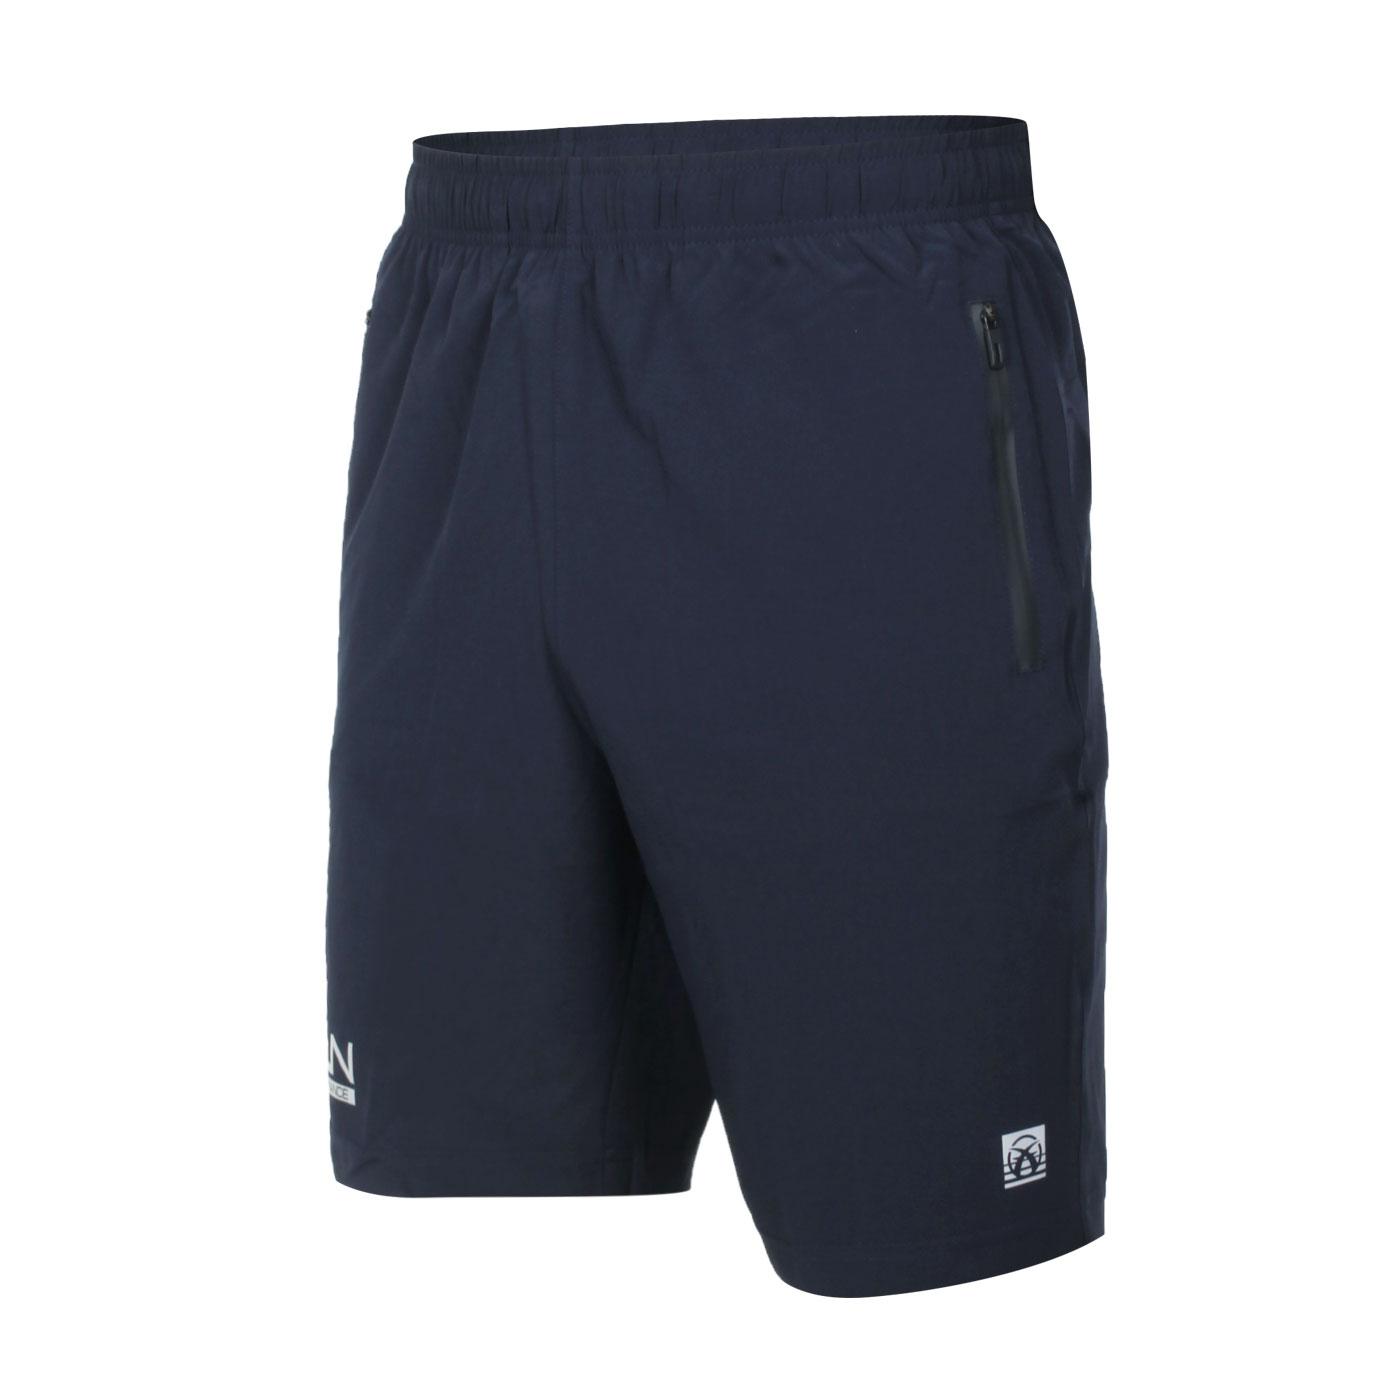 FIRESTAR 男款彈性平織短褲 C1715-93